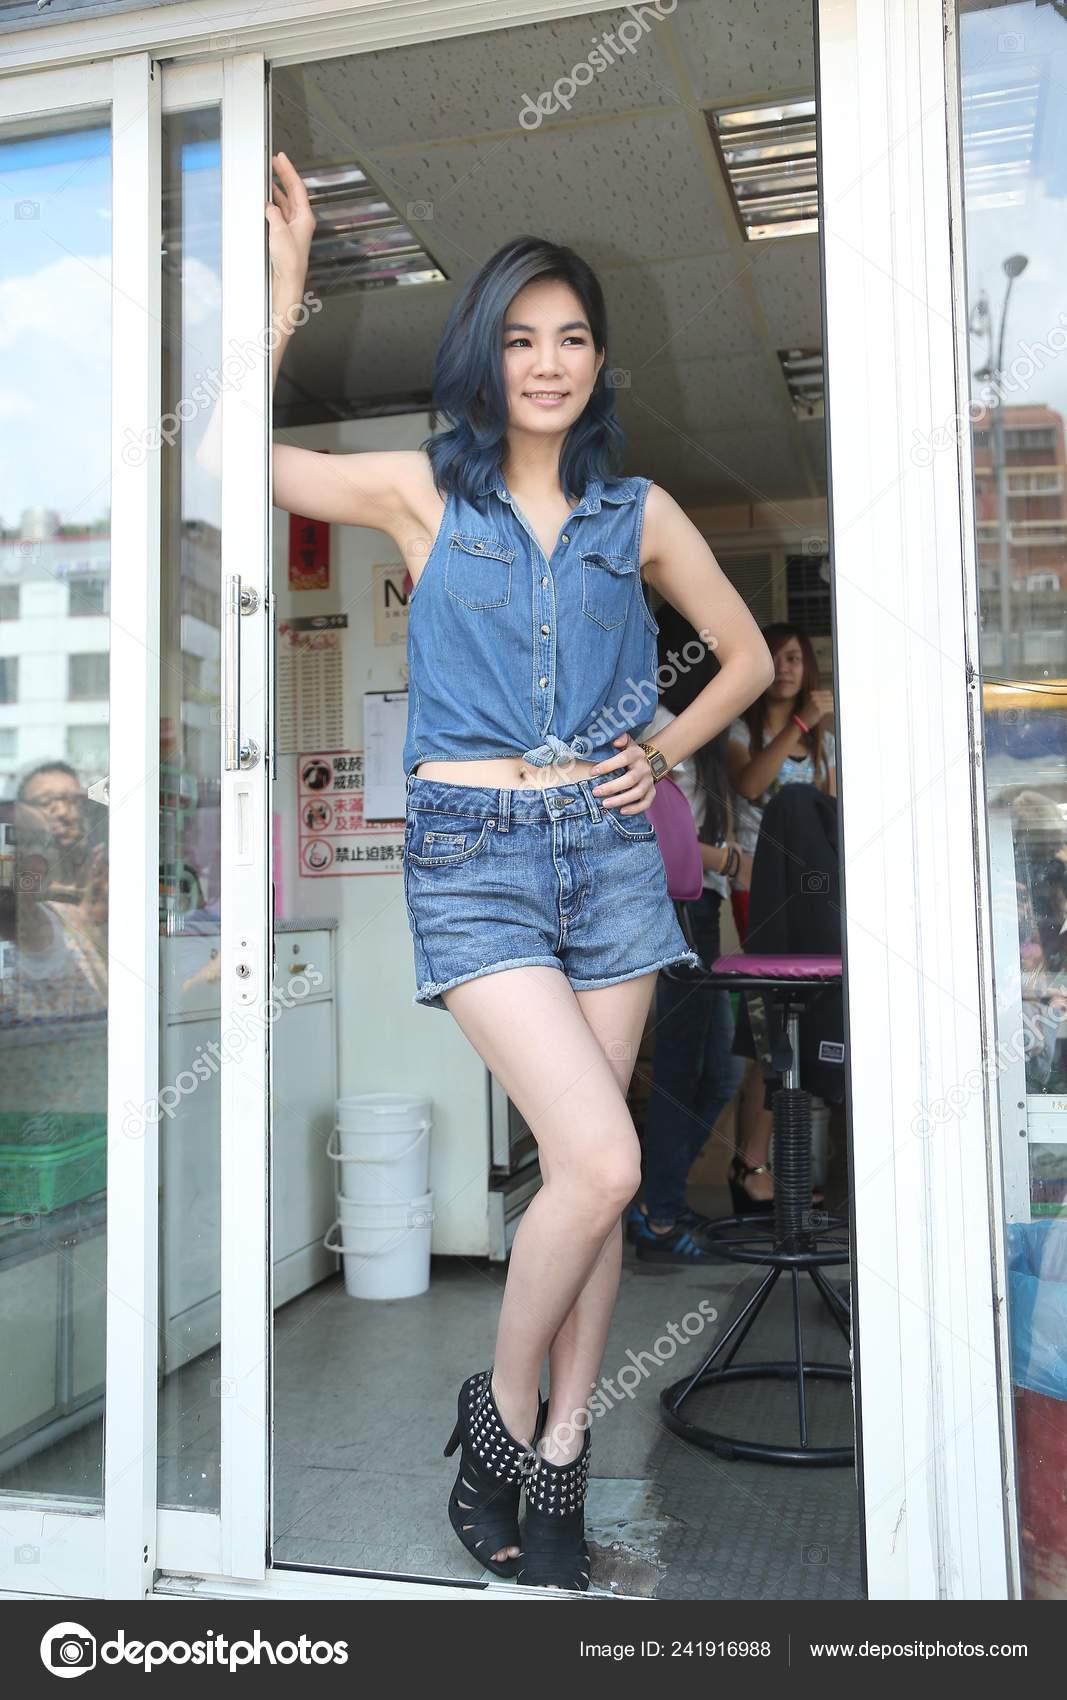 Ella Chen Taiwanese Girl Group Poses Areca Nut Stall She